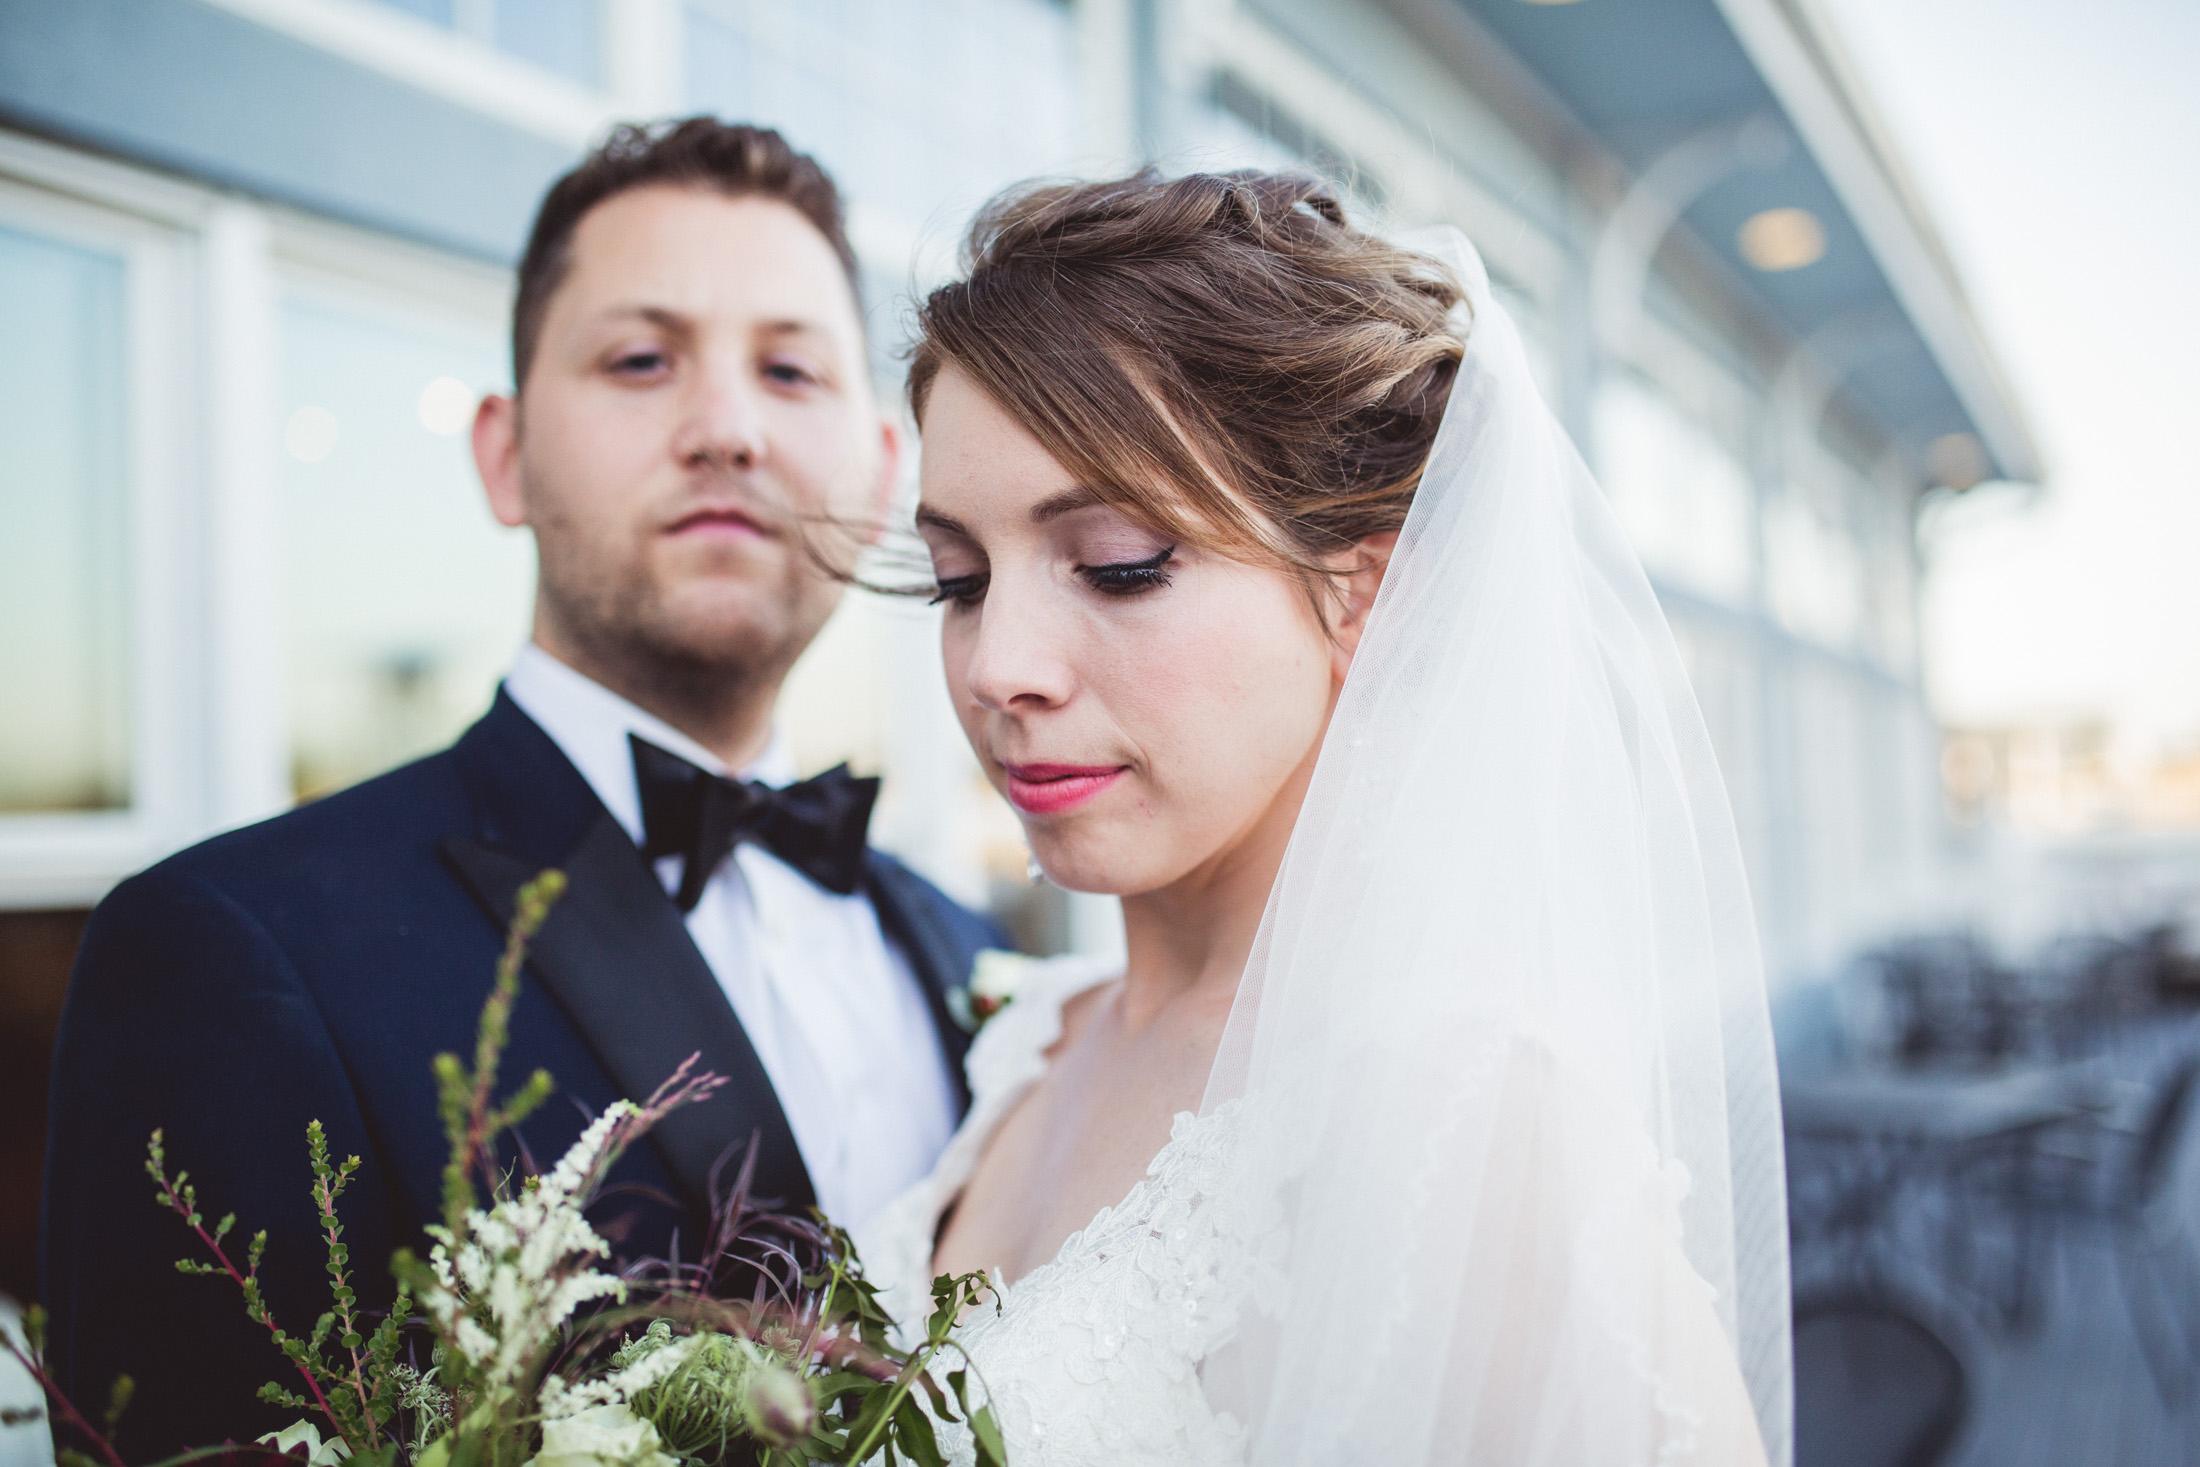 Cruiseport-Wedding-Photographer-26.jpg